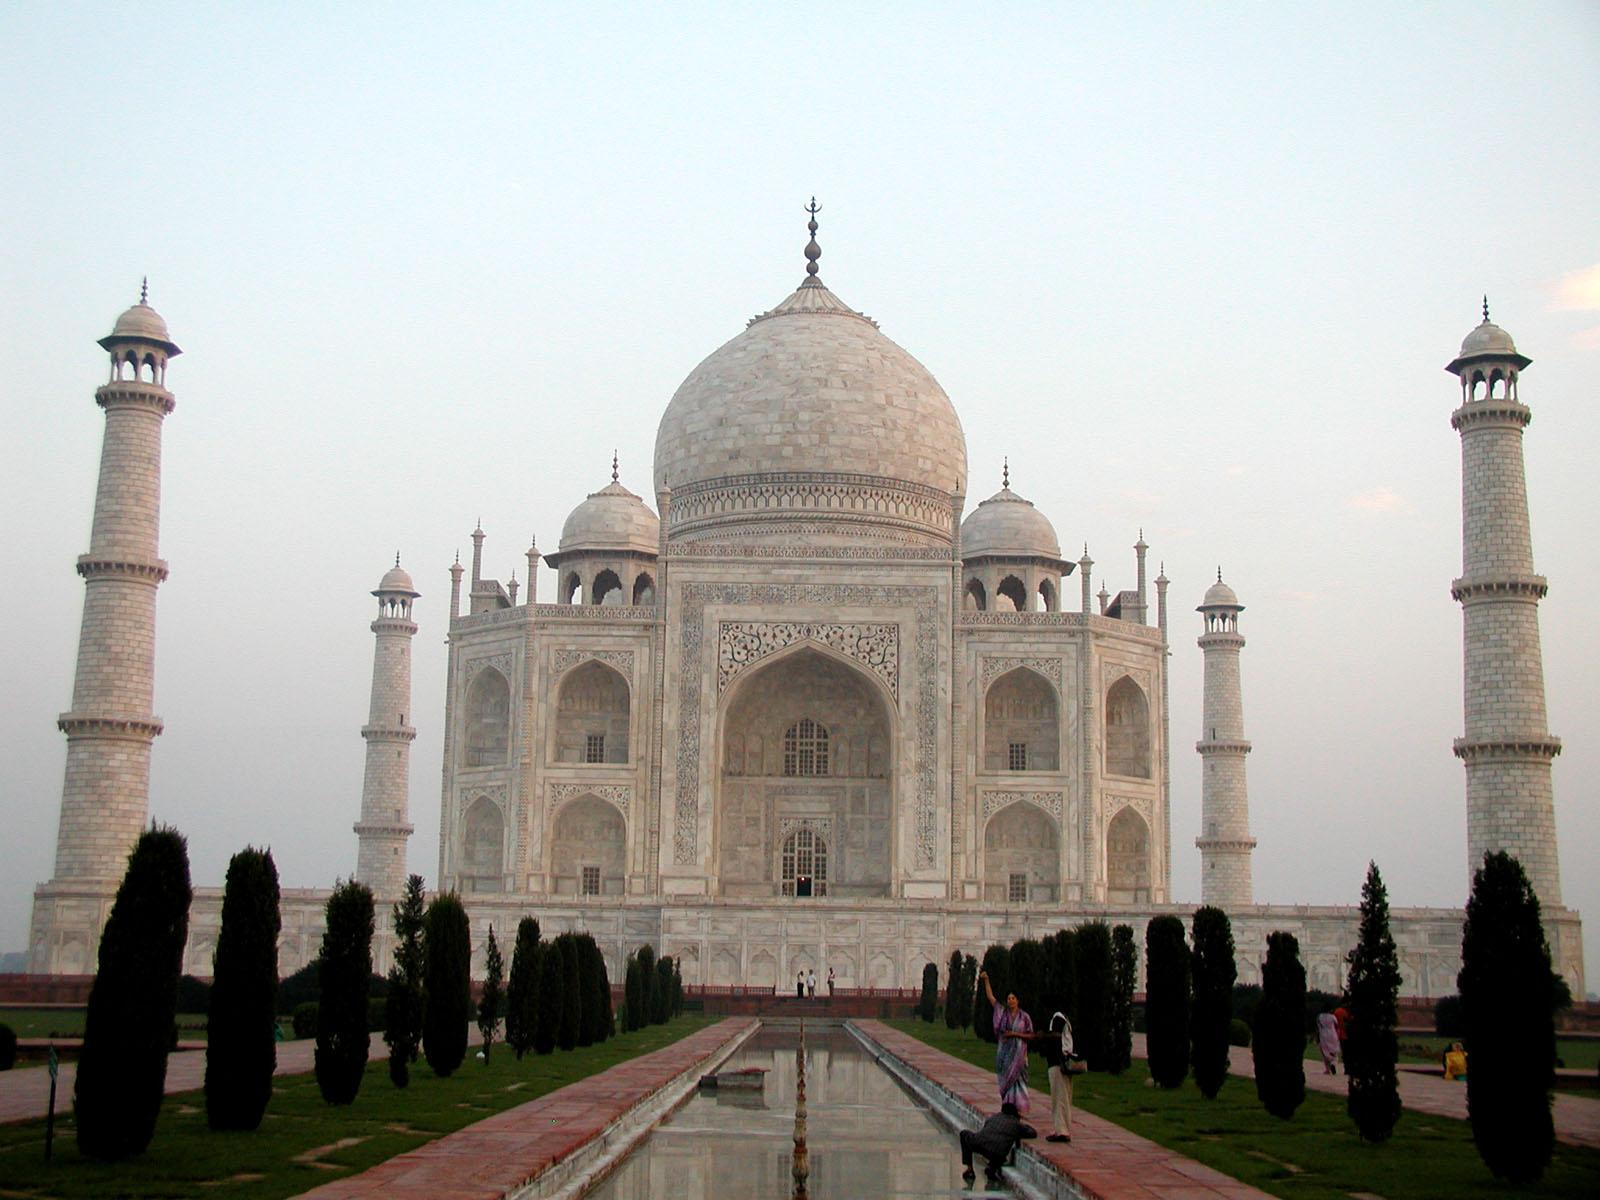 Image Of Taj Mahal Free Download: Free Games Wallpapers: Taj Mahal Free Wallpapers